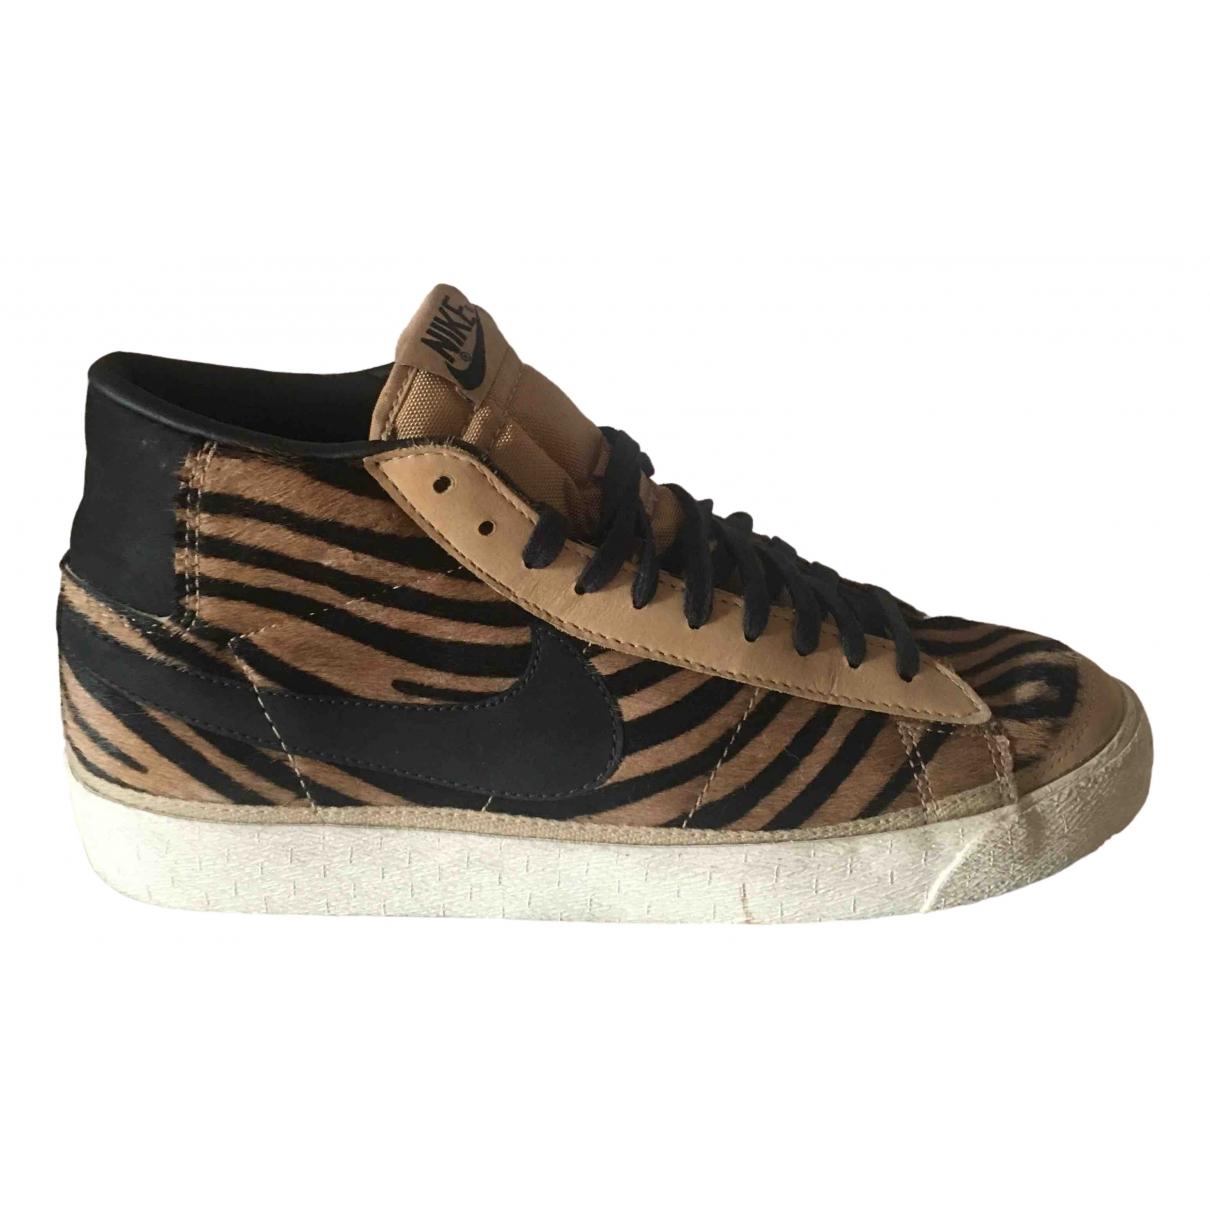 Nike Blazer Brown Leather Trainers for Women 42.5 EU